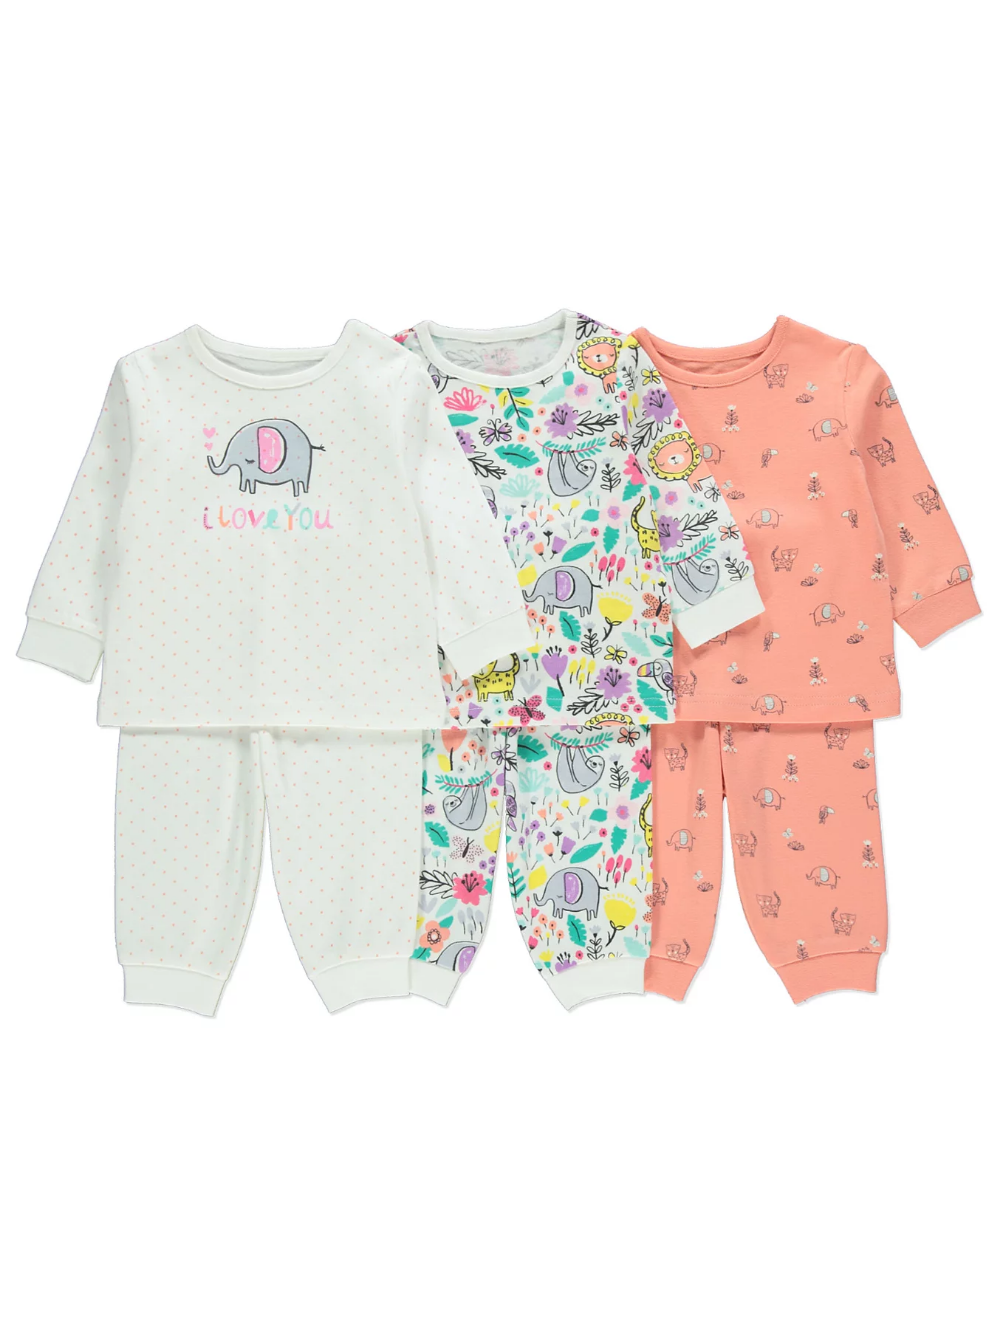 bluezoo Kids Pack of Two Babies Blue Animal Print Sleepsuits